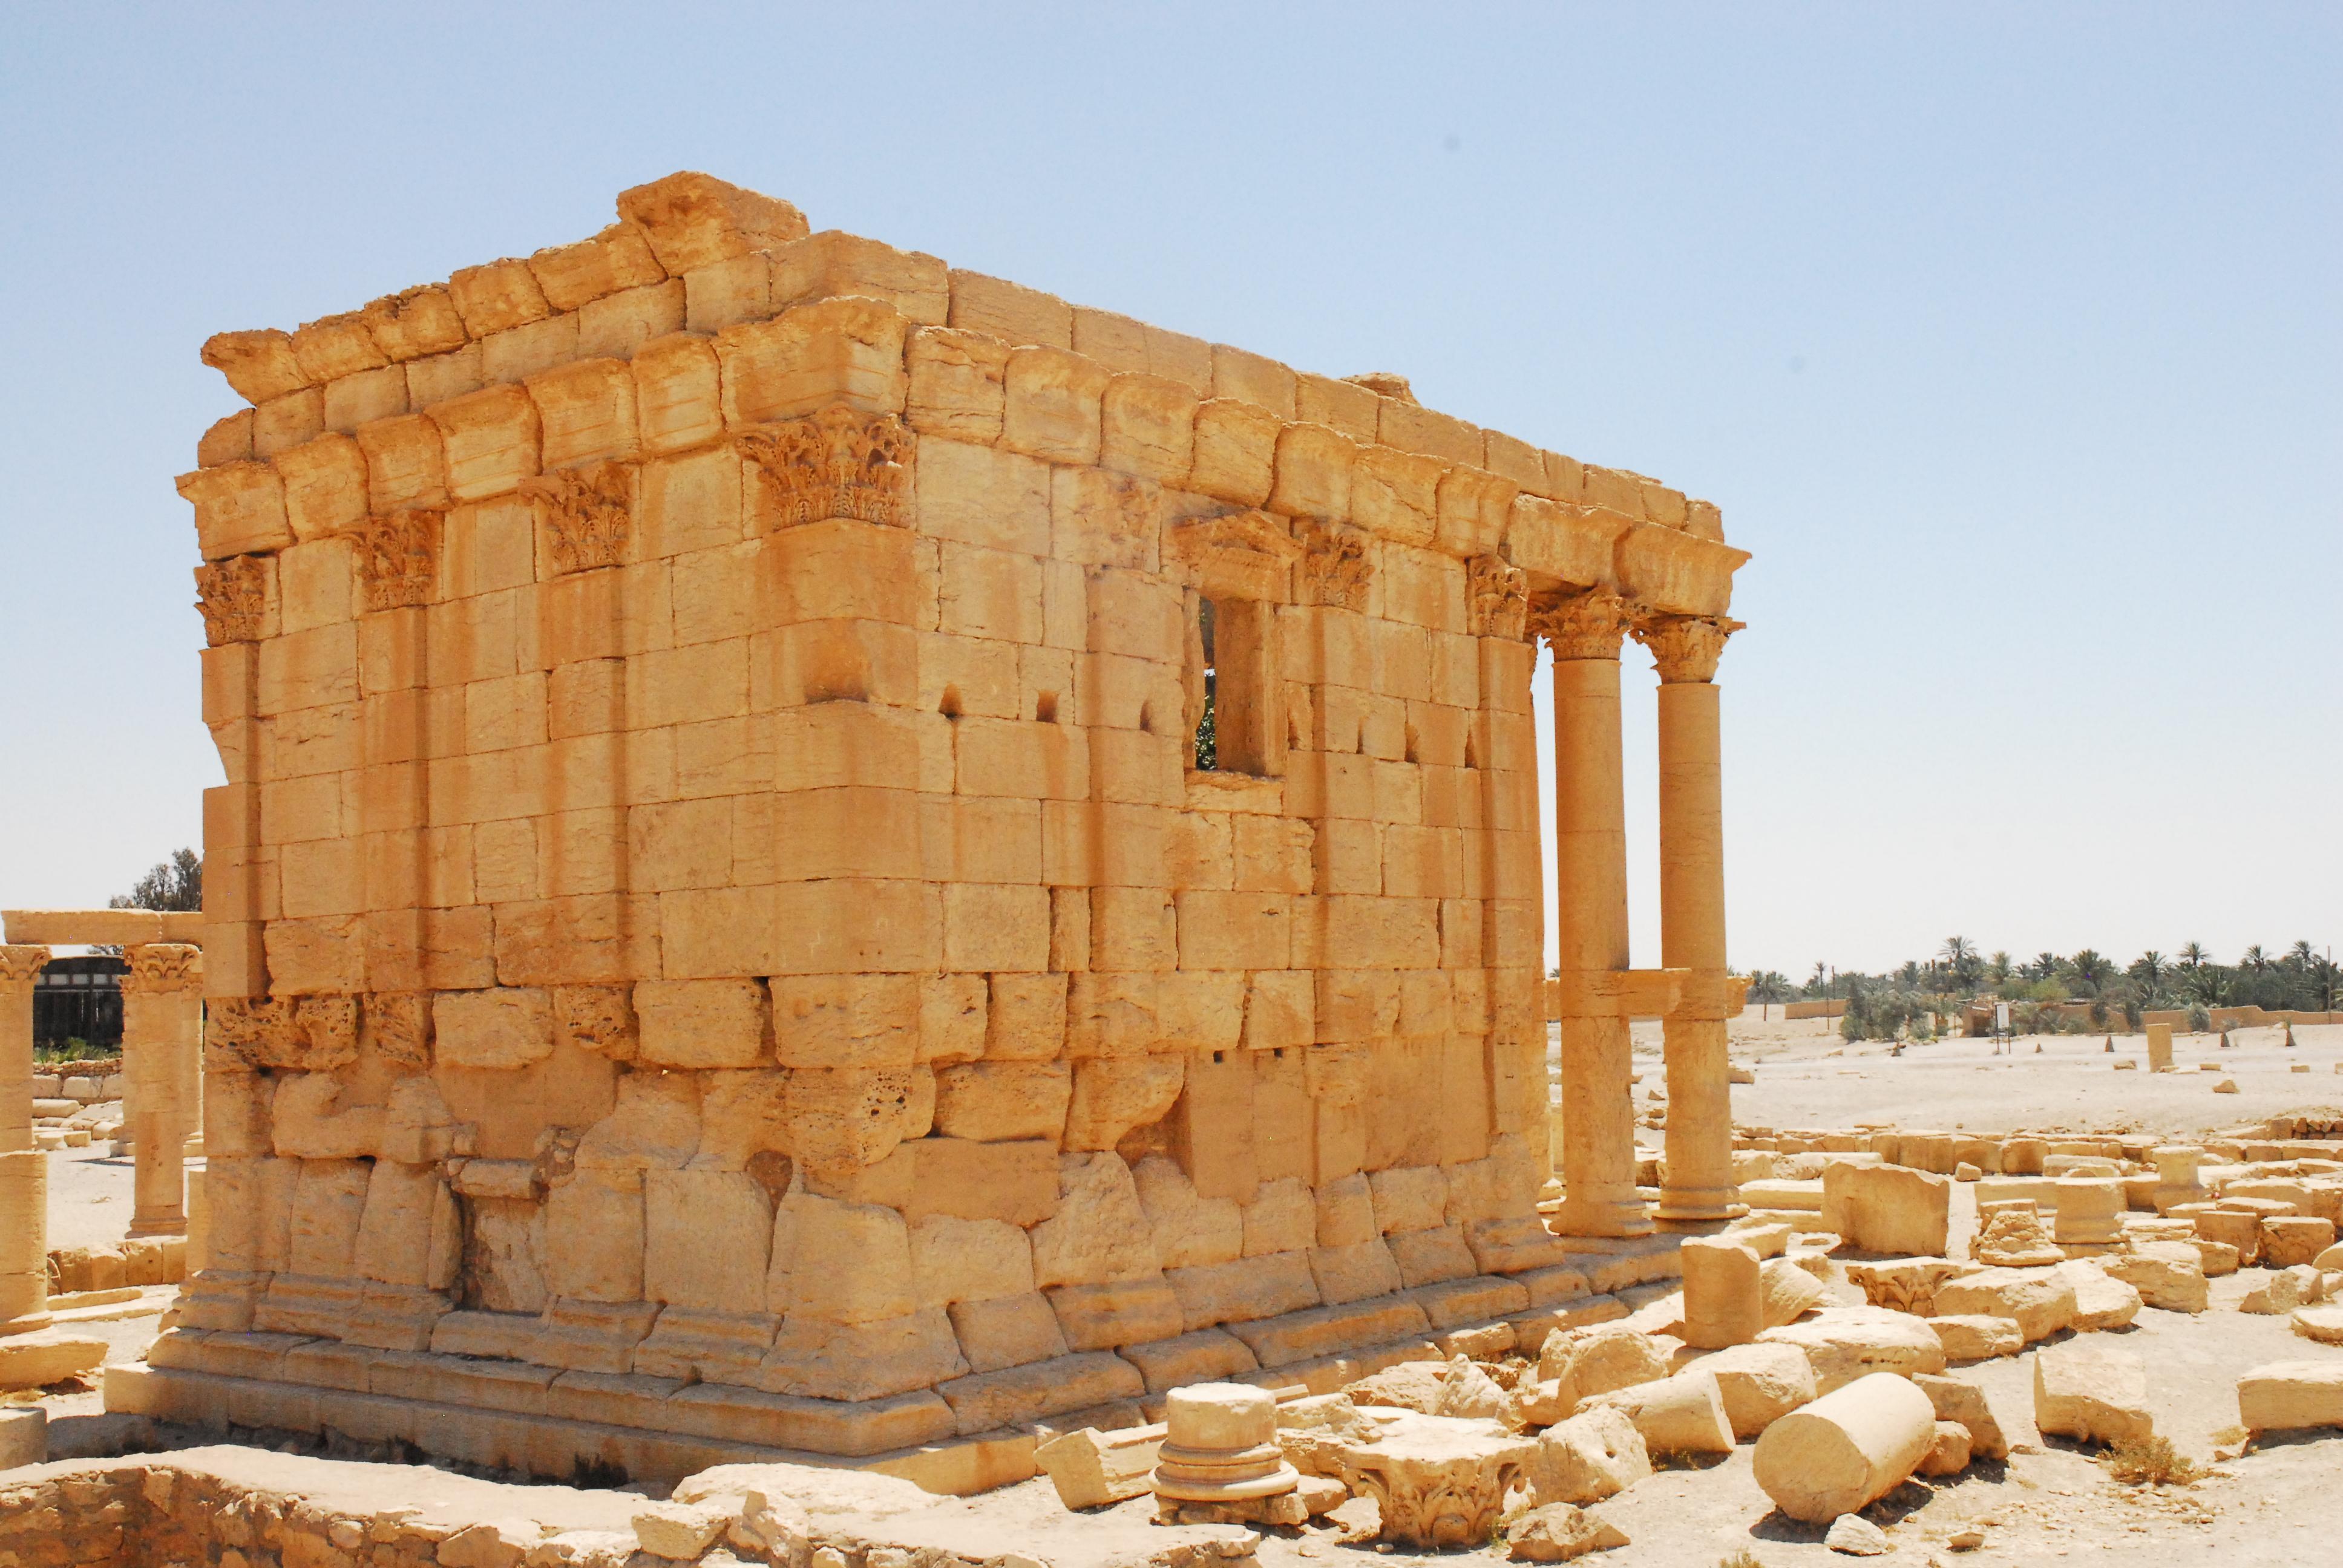 Figure 13: Baalshamin Temple (Michael Danti; 2010)